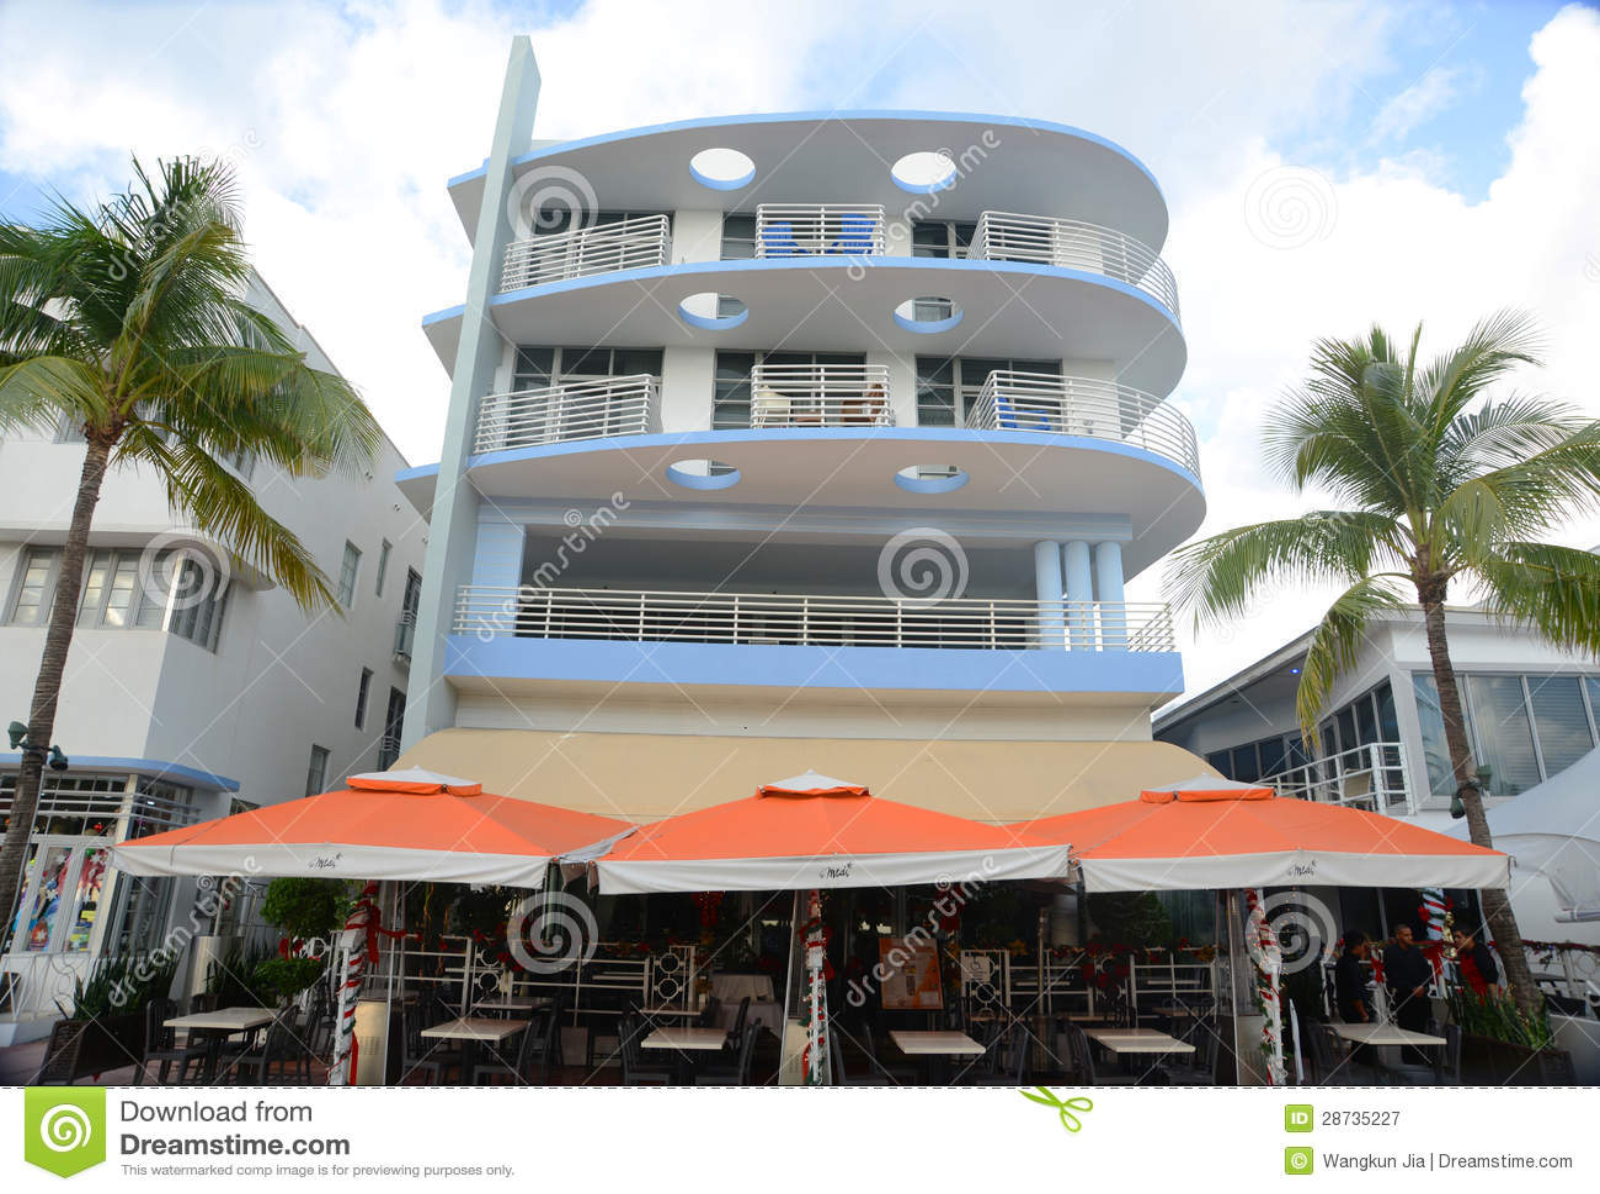 Best hotel deals in miami south beach